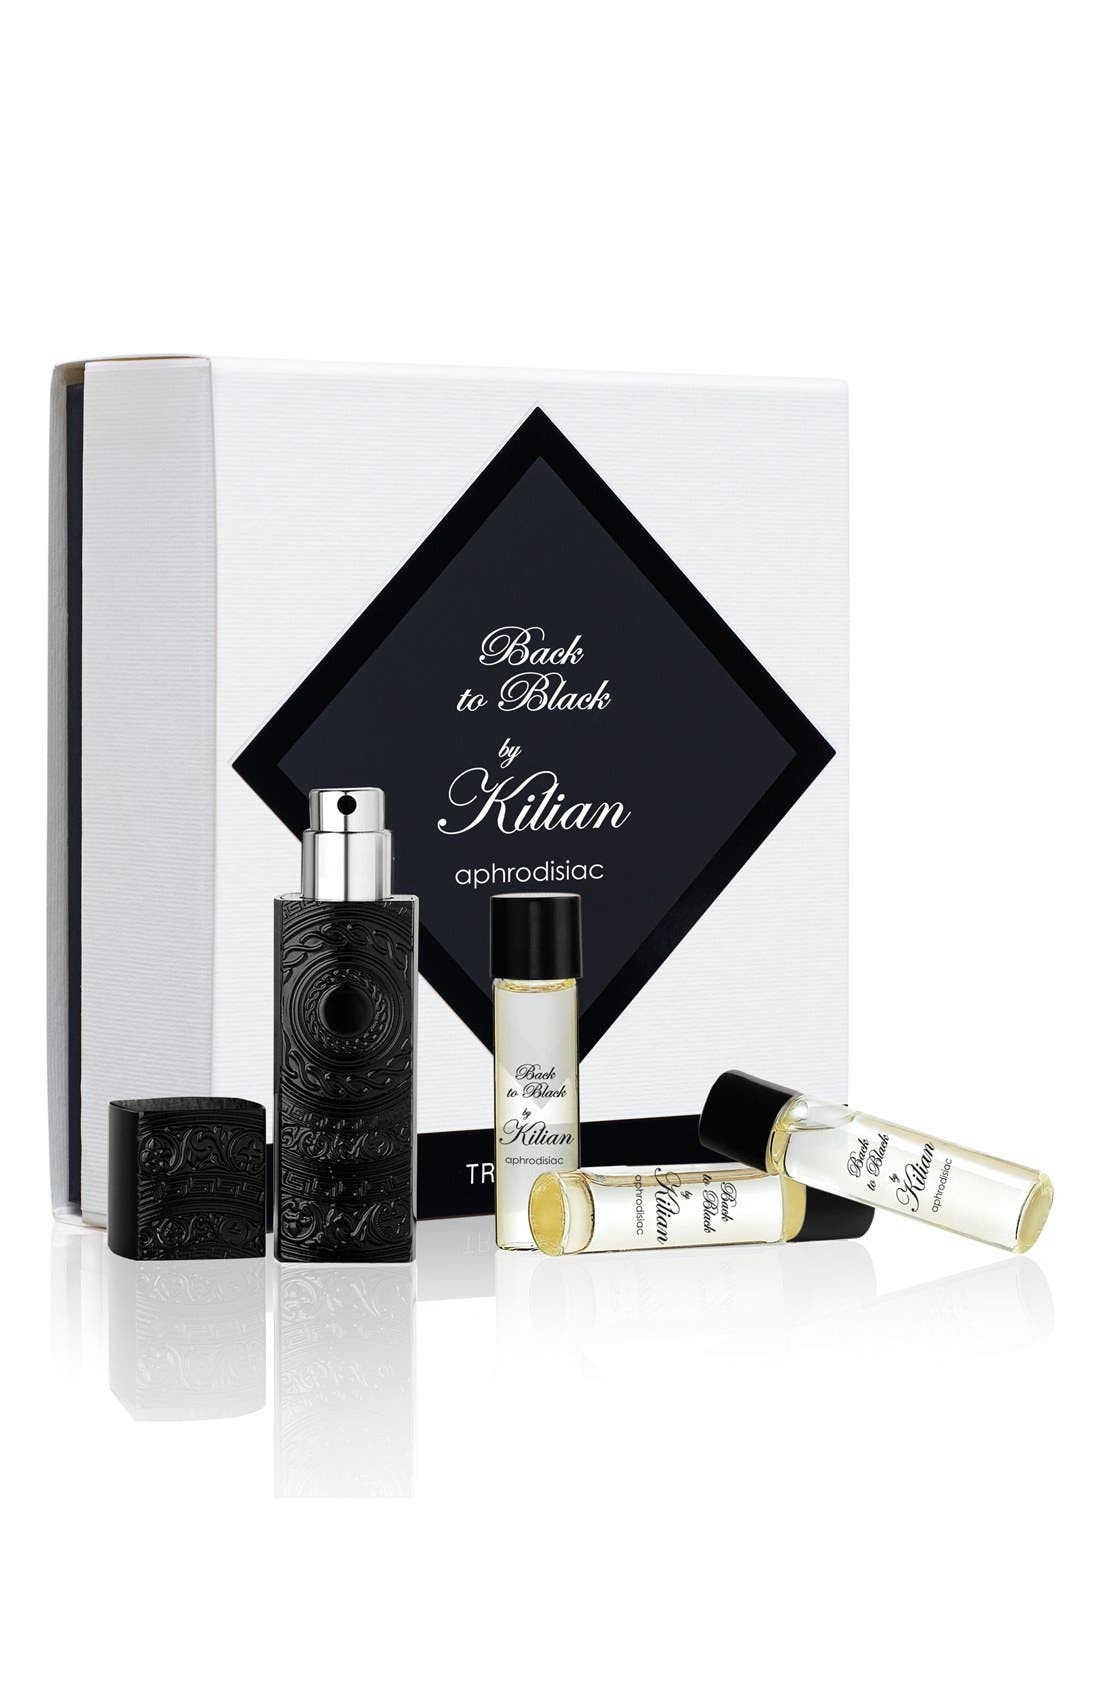 Kilian 'L'Oeuvre Noire - Back to Black, aphrodisiac' Travel Set